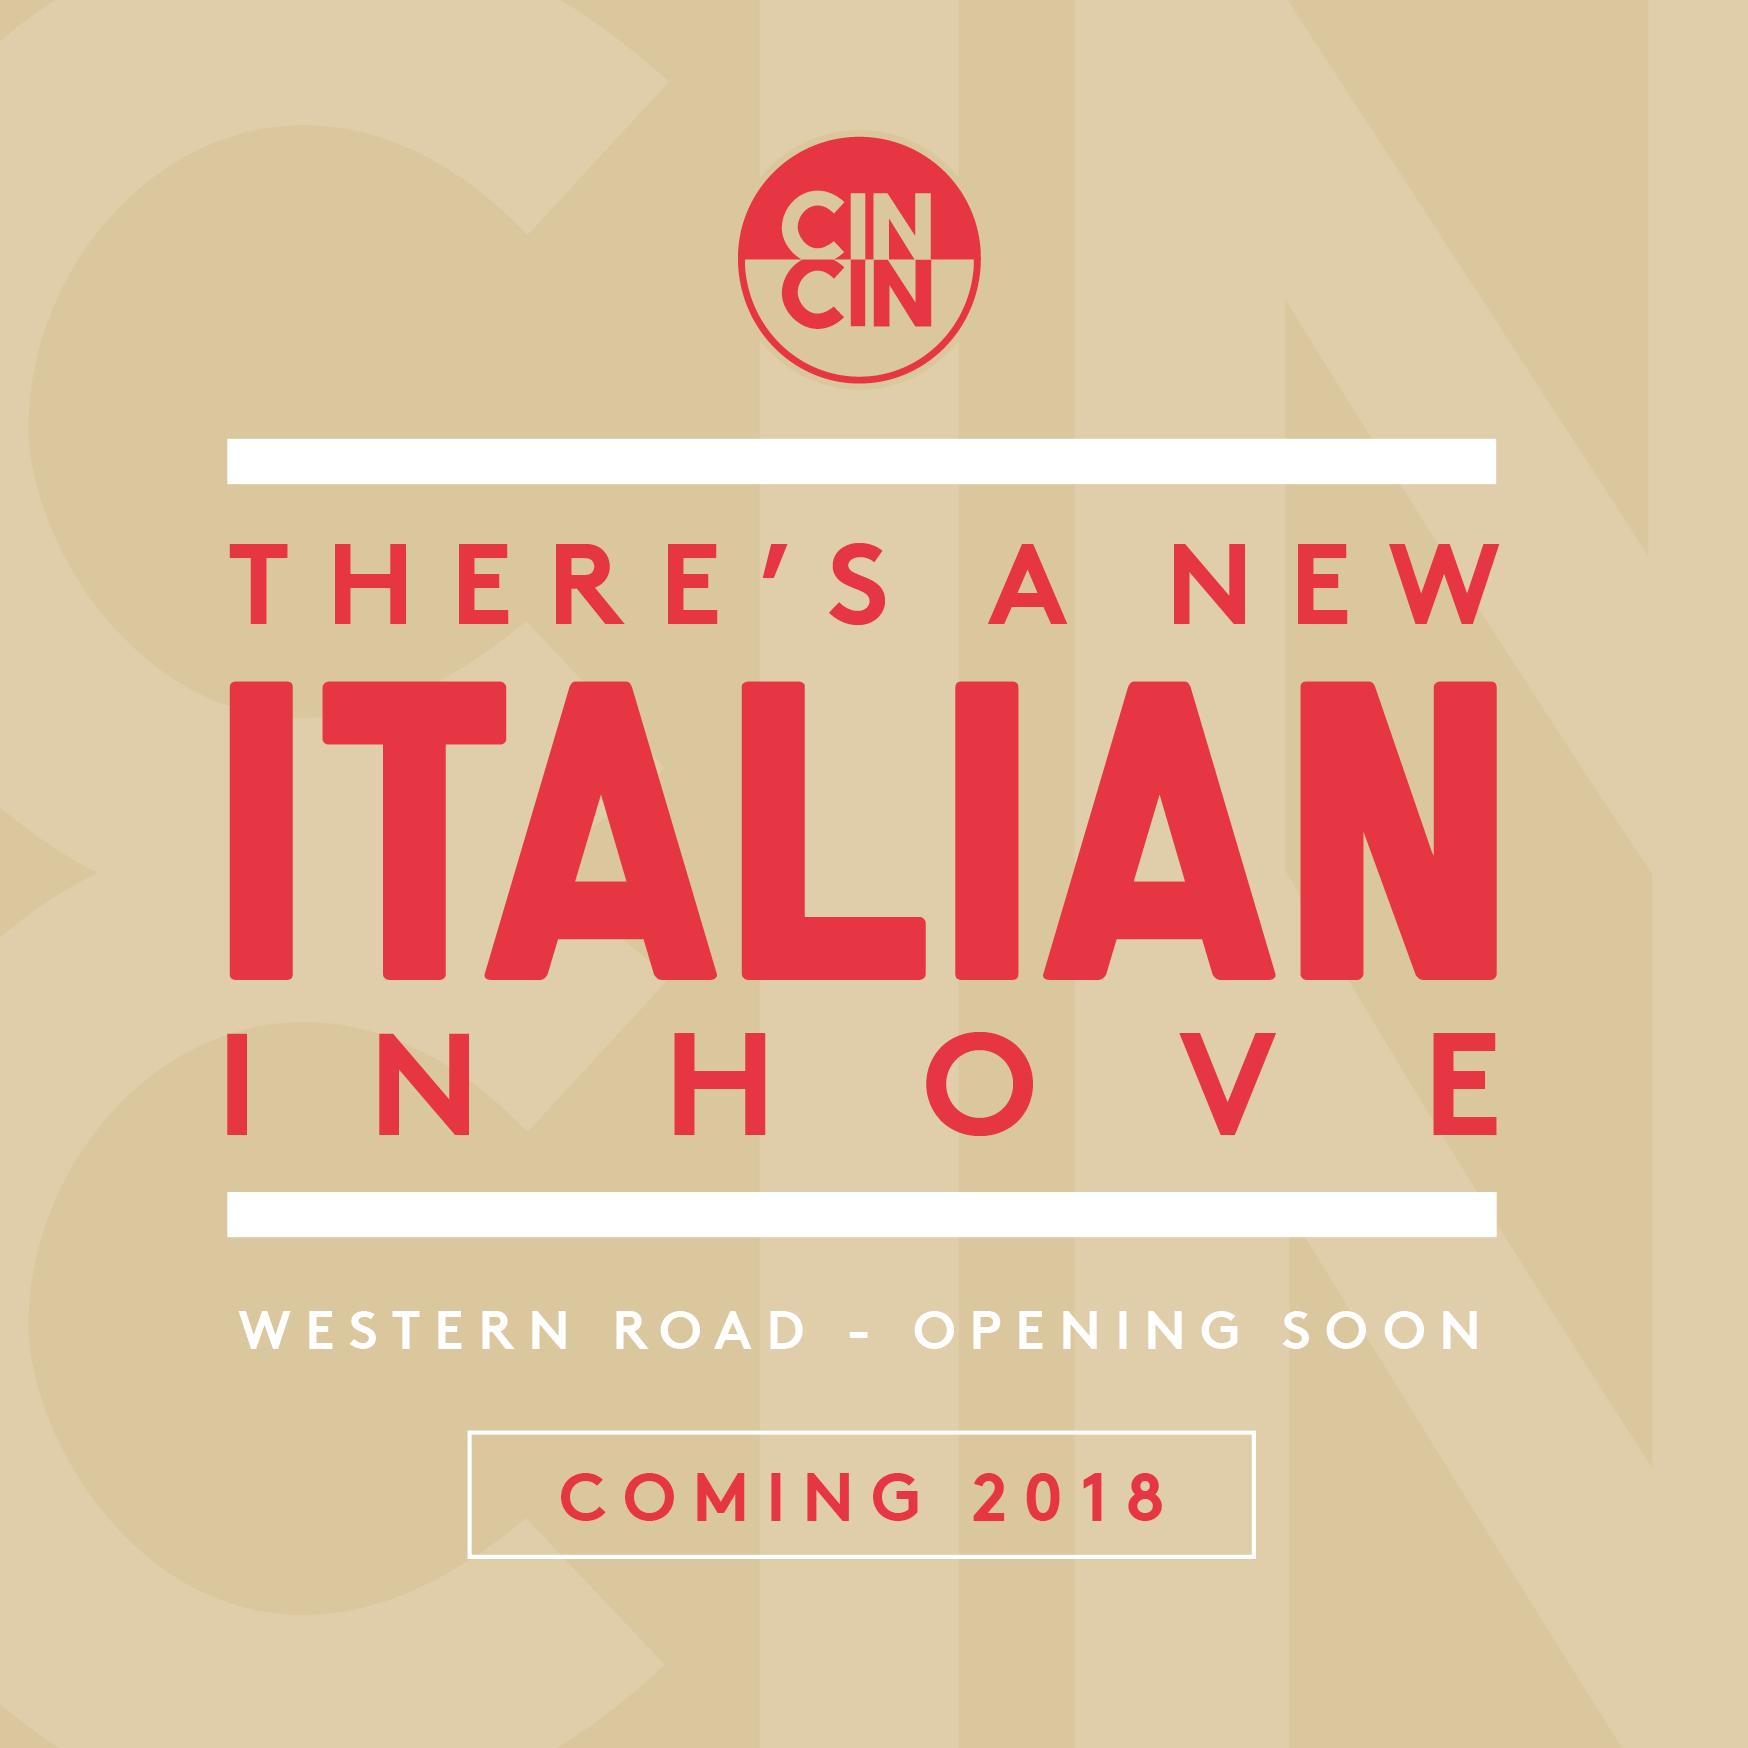 Cin-Cin-Western-Road-Teaser-Instagram-V1-1611173